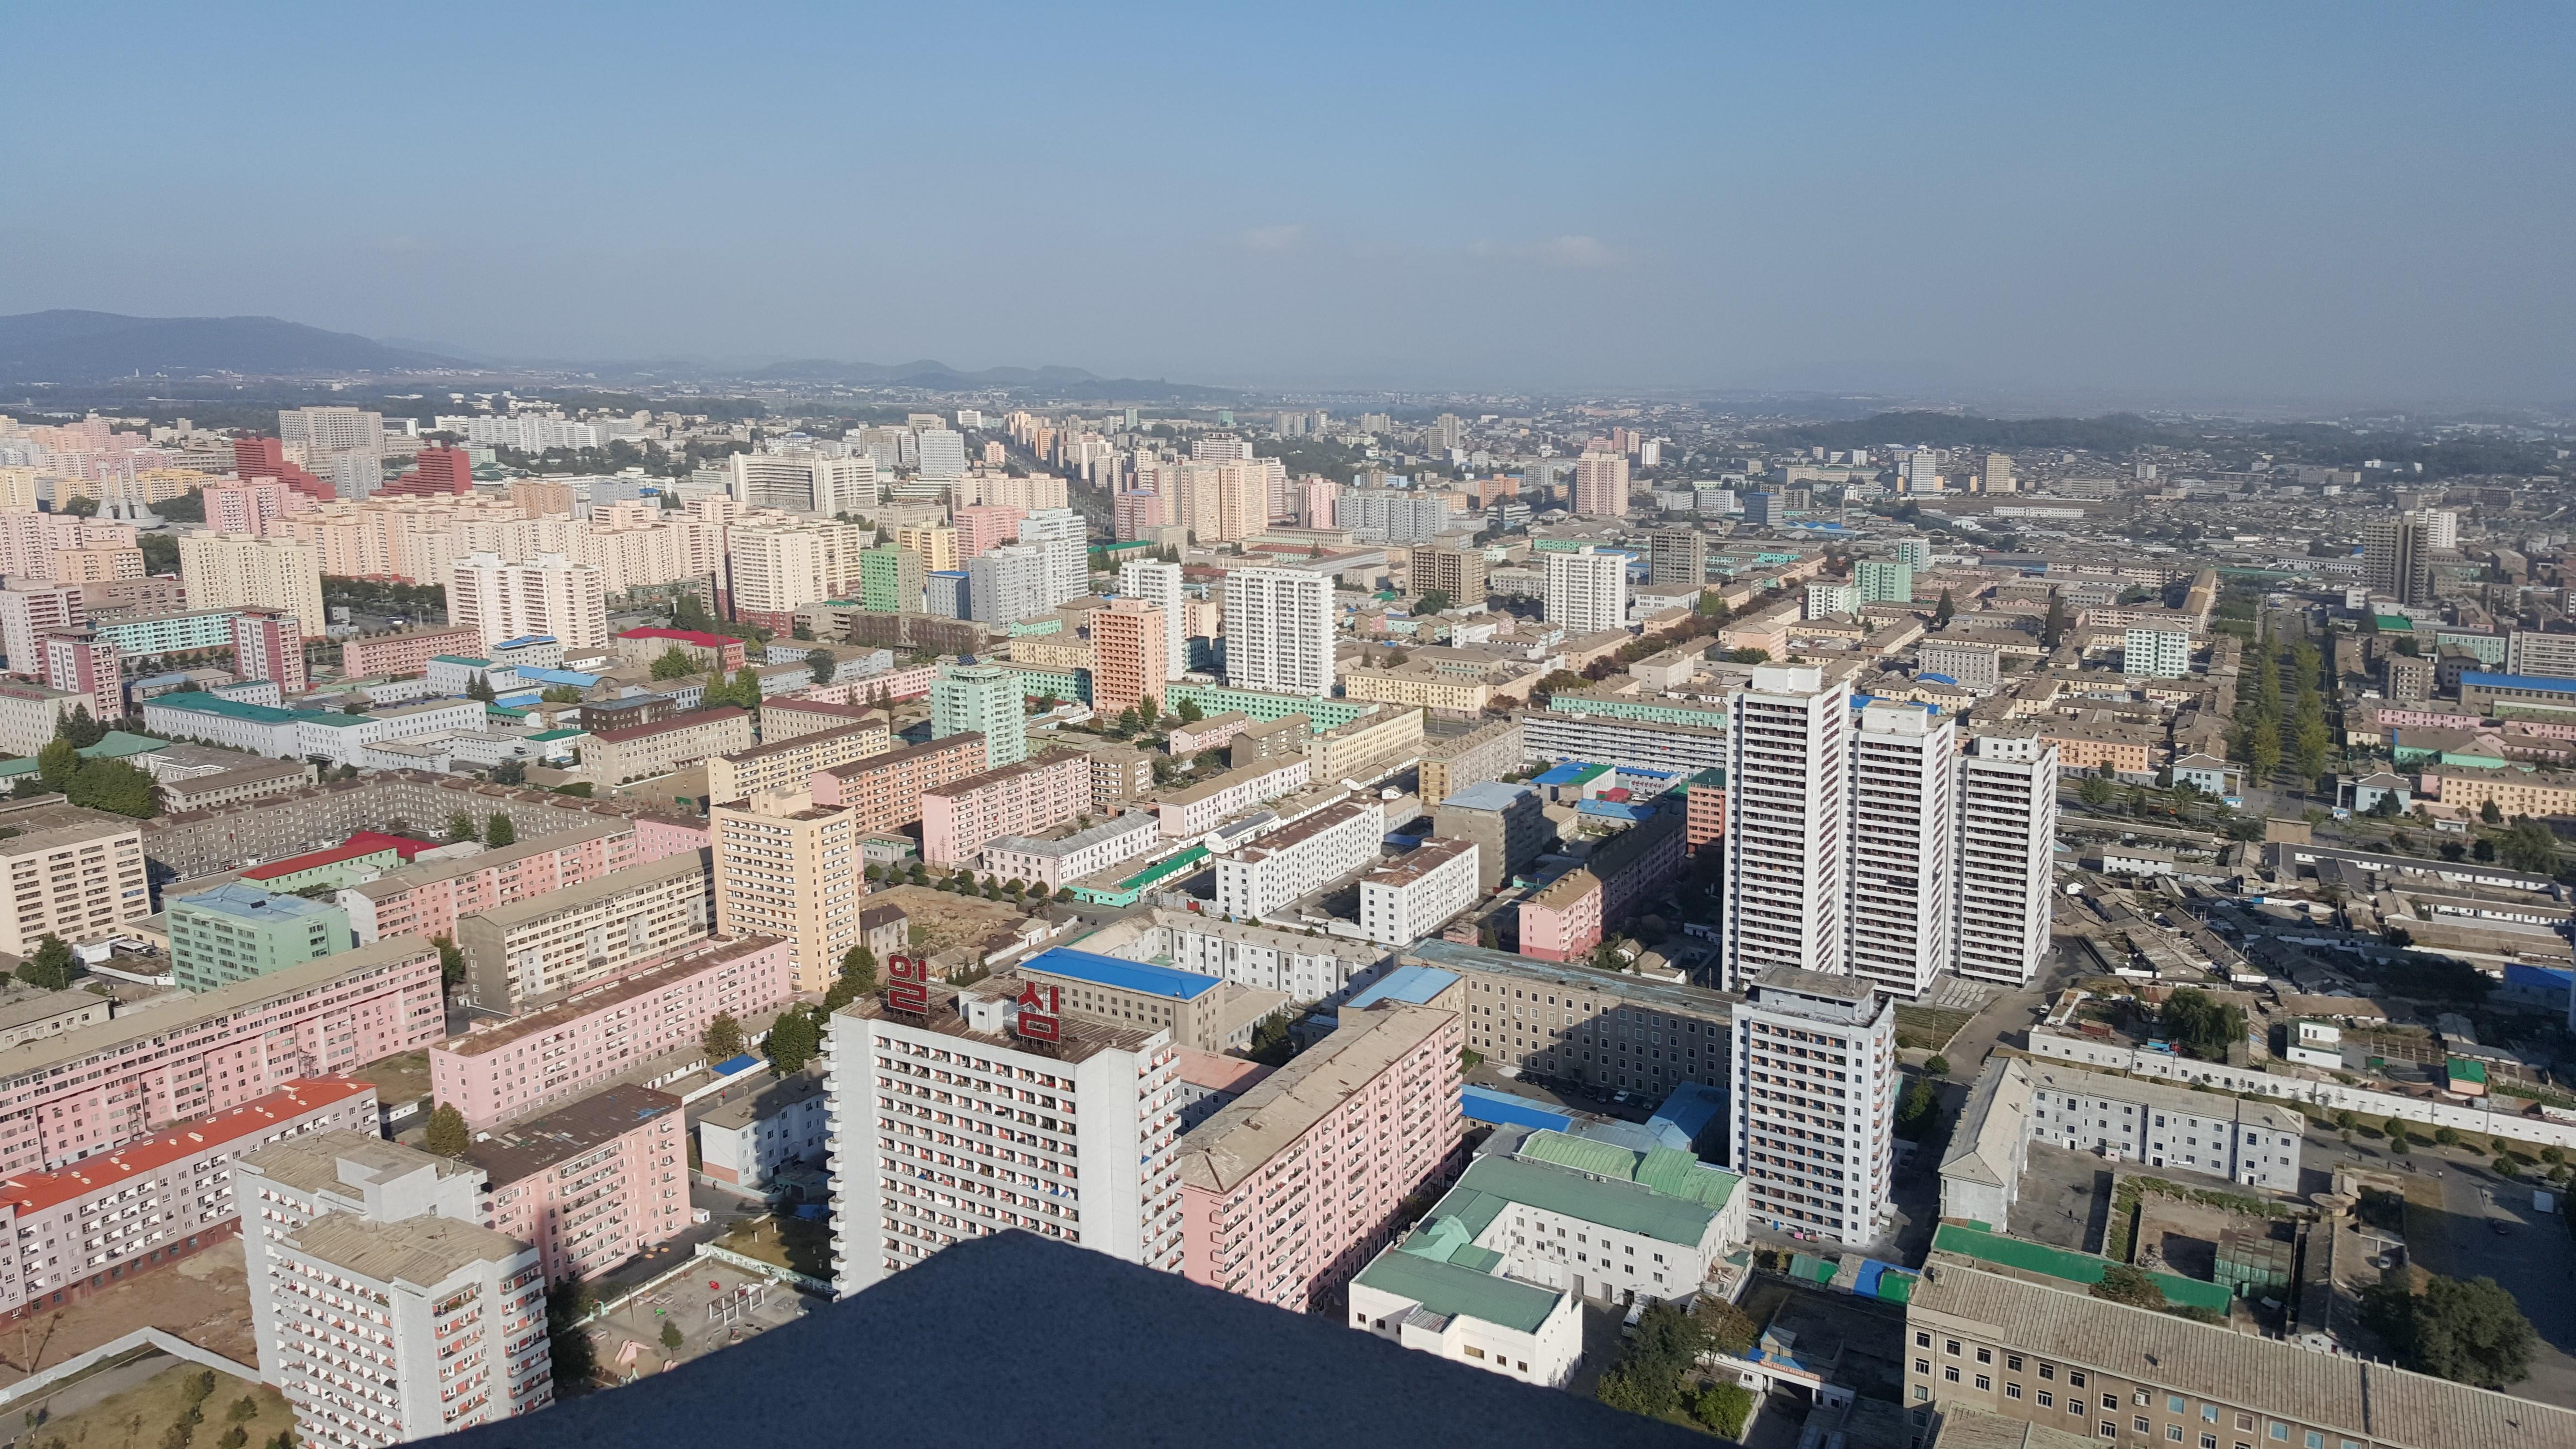 Hovedstaden Pyongyang, en by med 2,5 millioner innbyggere.